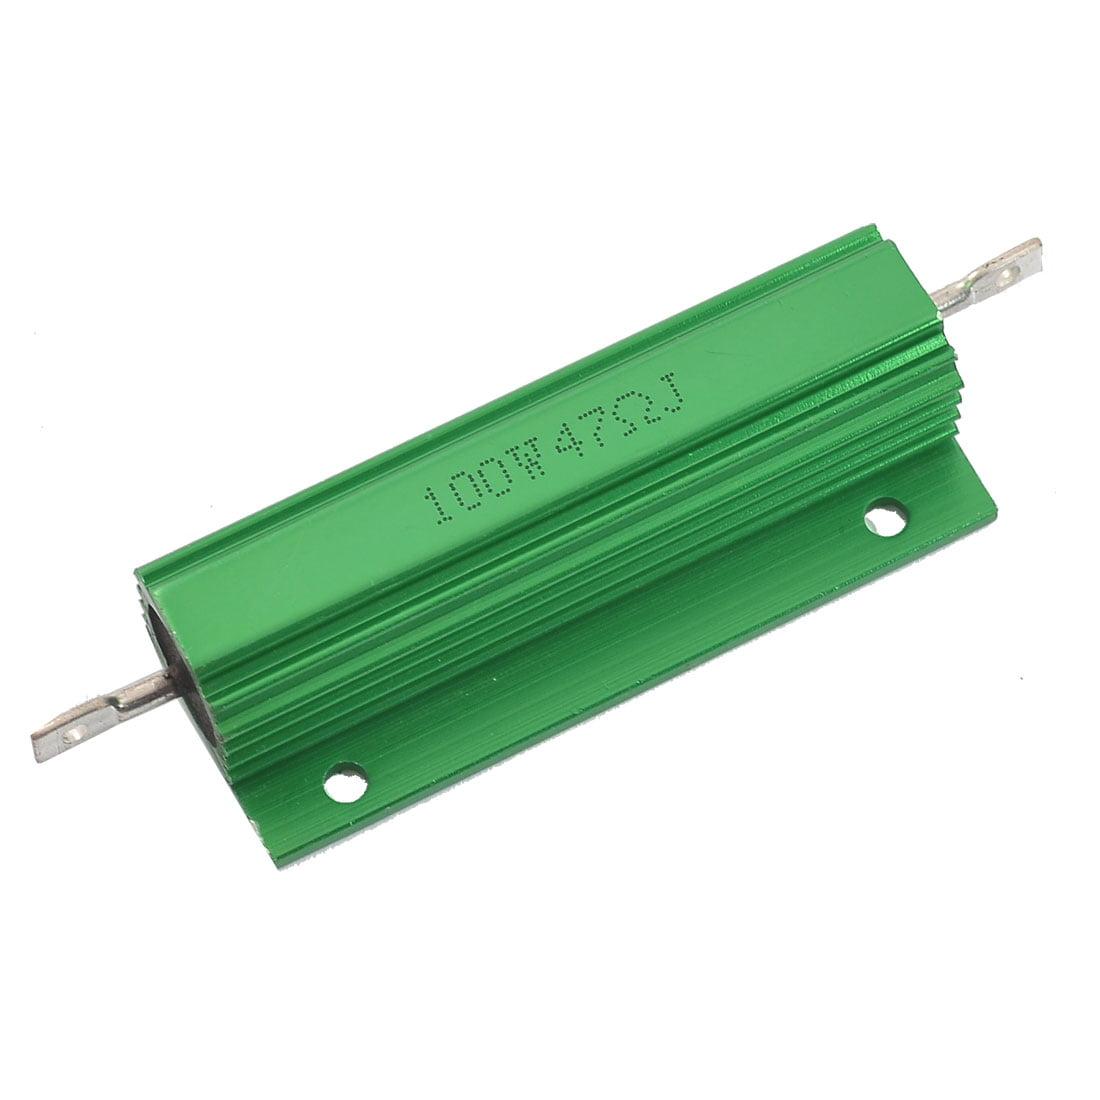 Unique Bargains Aluminum Case 100W Watt 47 Ohm 5% Wirewound Resistor for Transducer - image 1 of 1